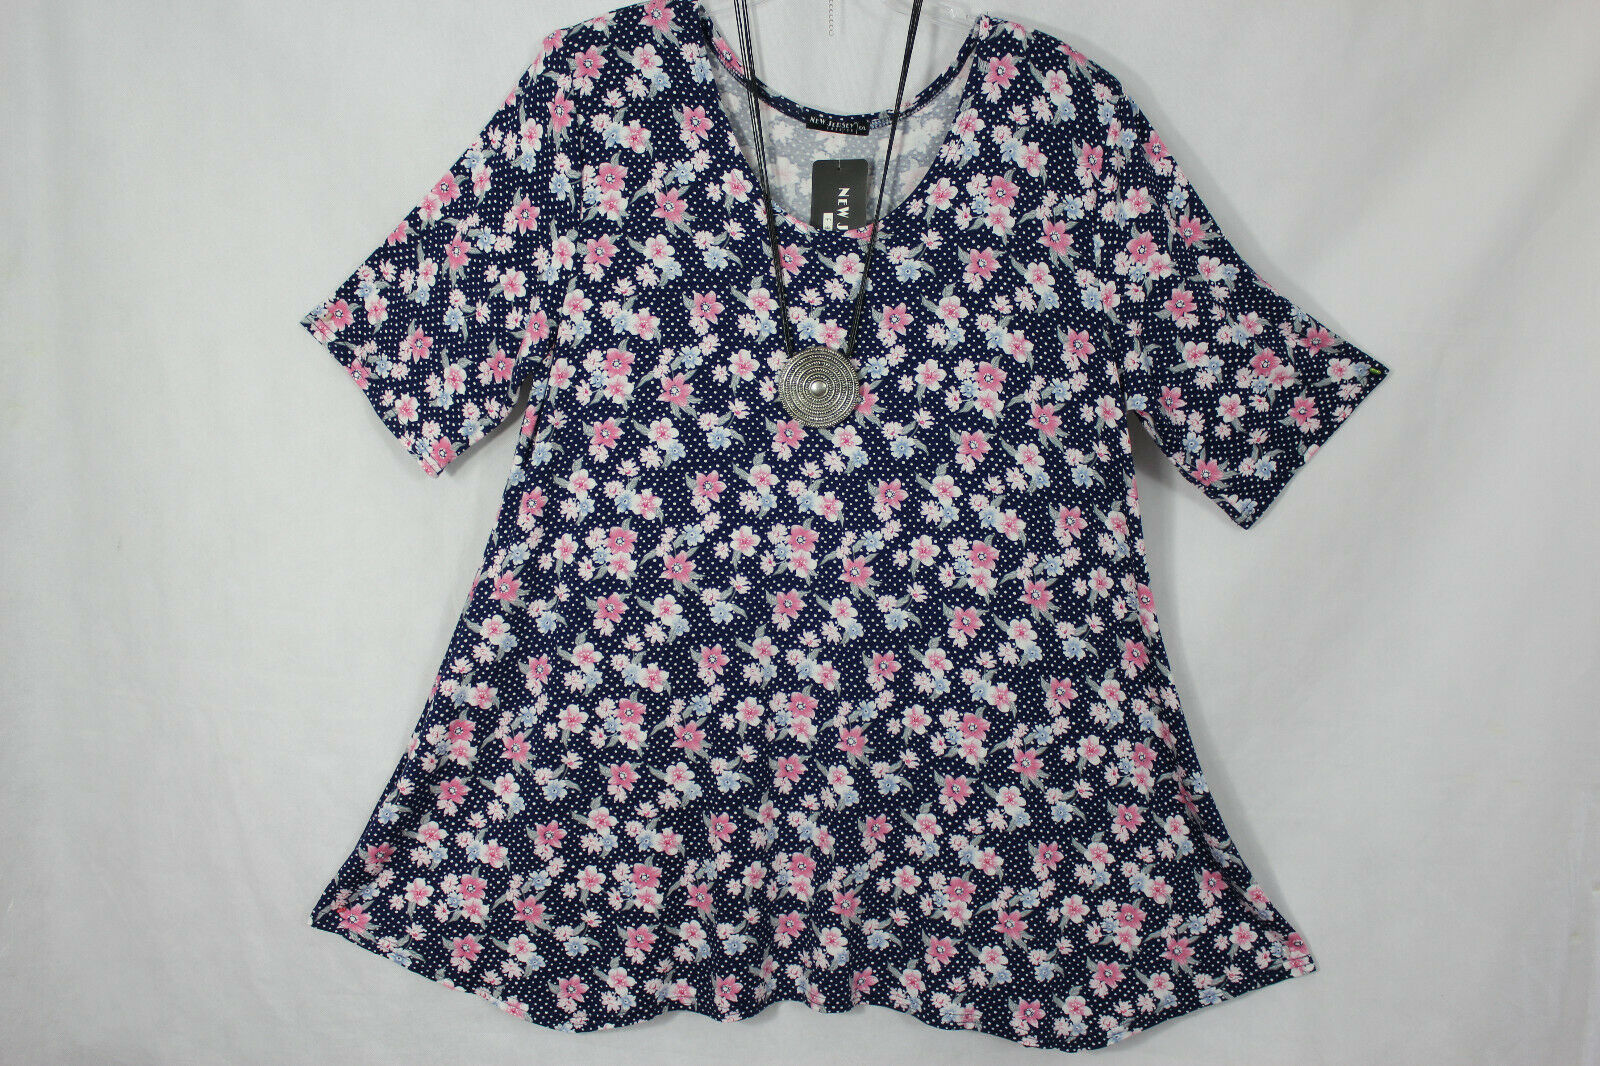 New Jersey Tunika Shirt Kleid Frühjahr/Sommer A-Linie Gr.L, Gr.40